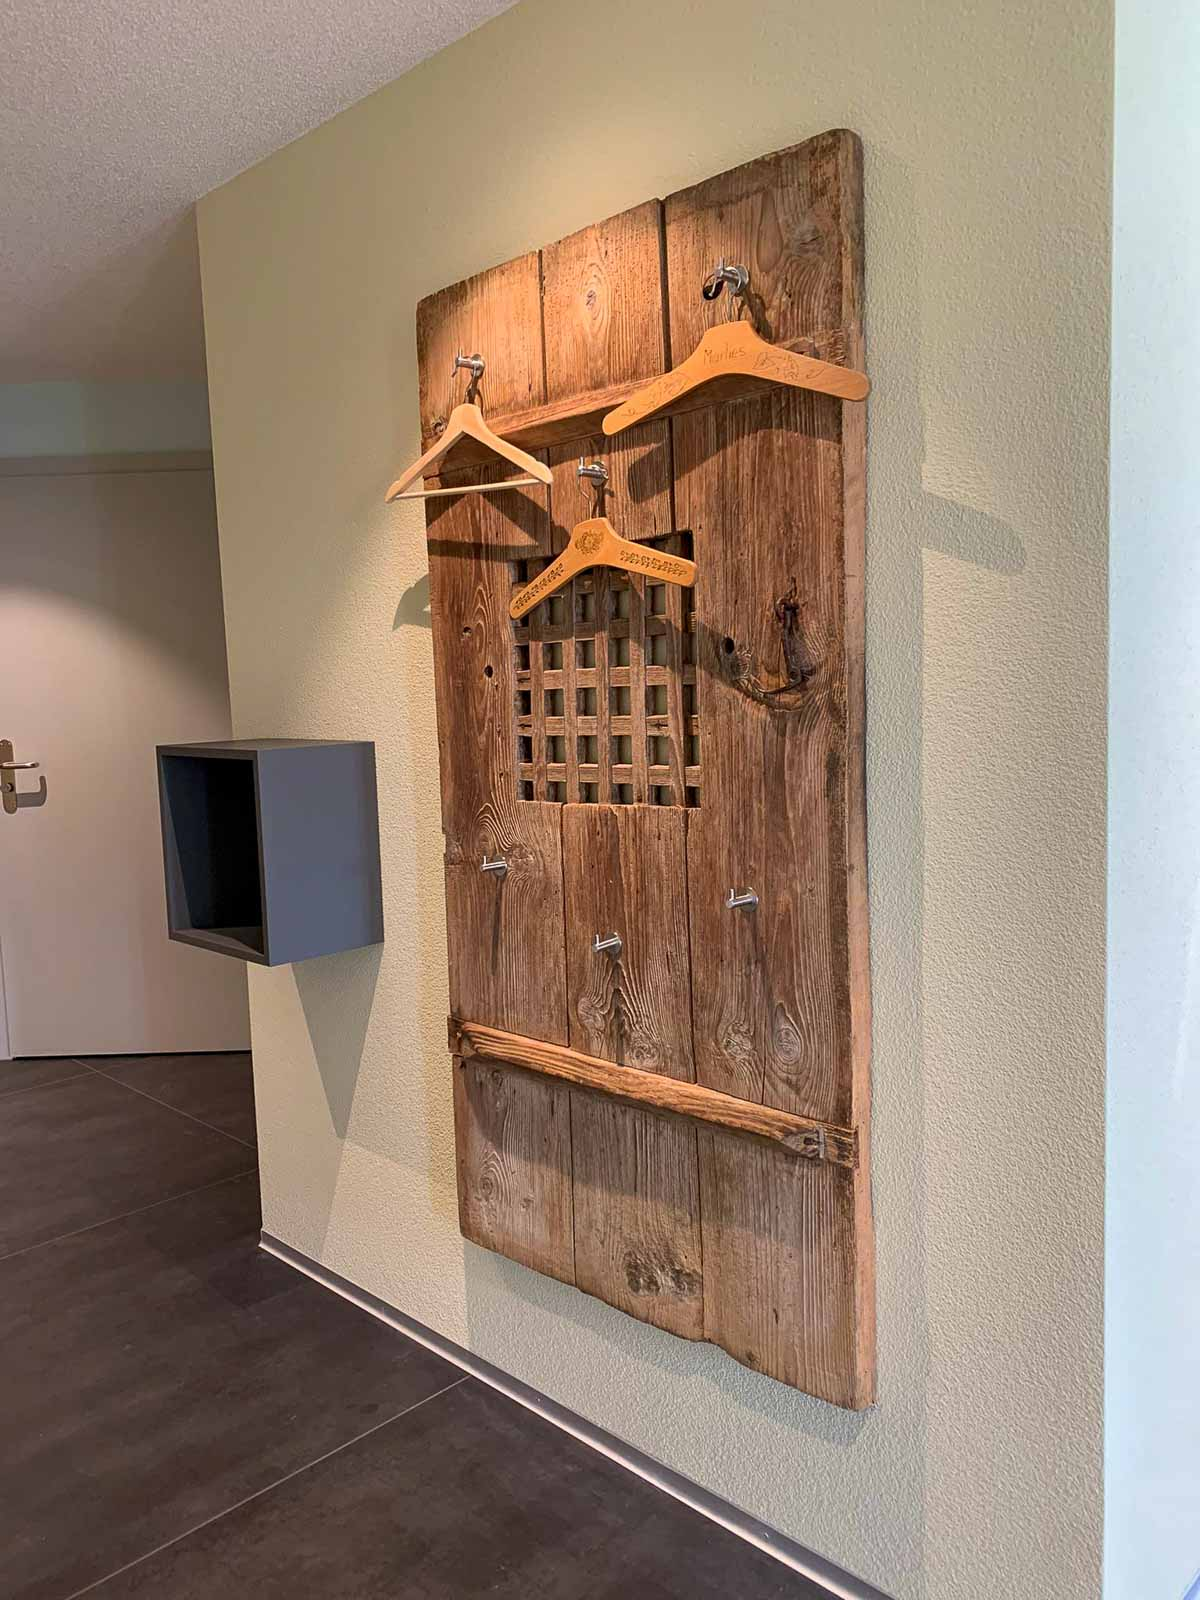 Woodddesign_Holzdesign_Altholz_Garderobe_modern_rustikal_gebürstet_Gästegarderobe (6)